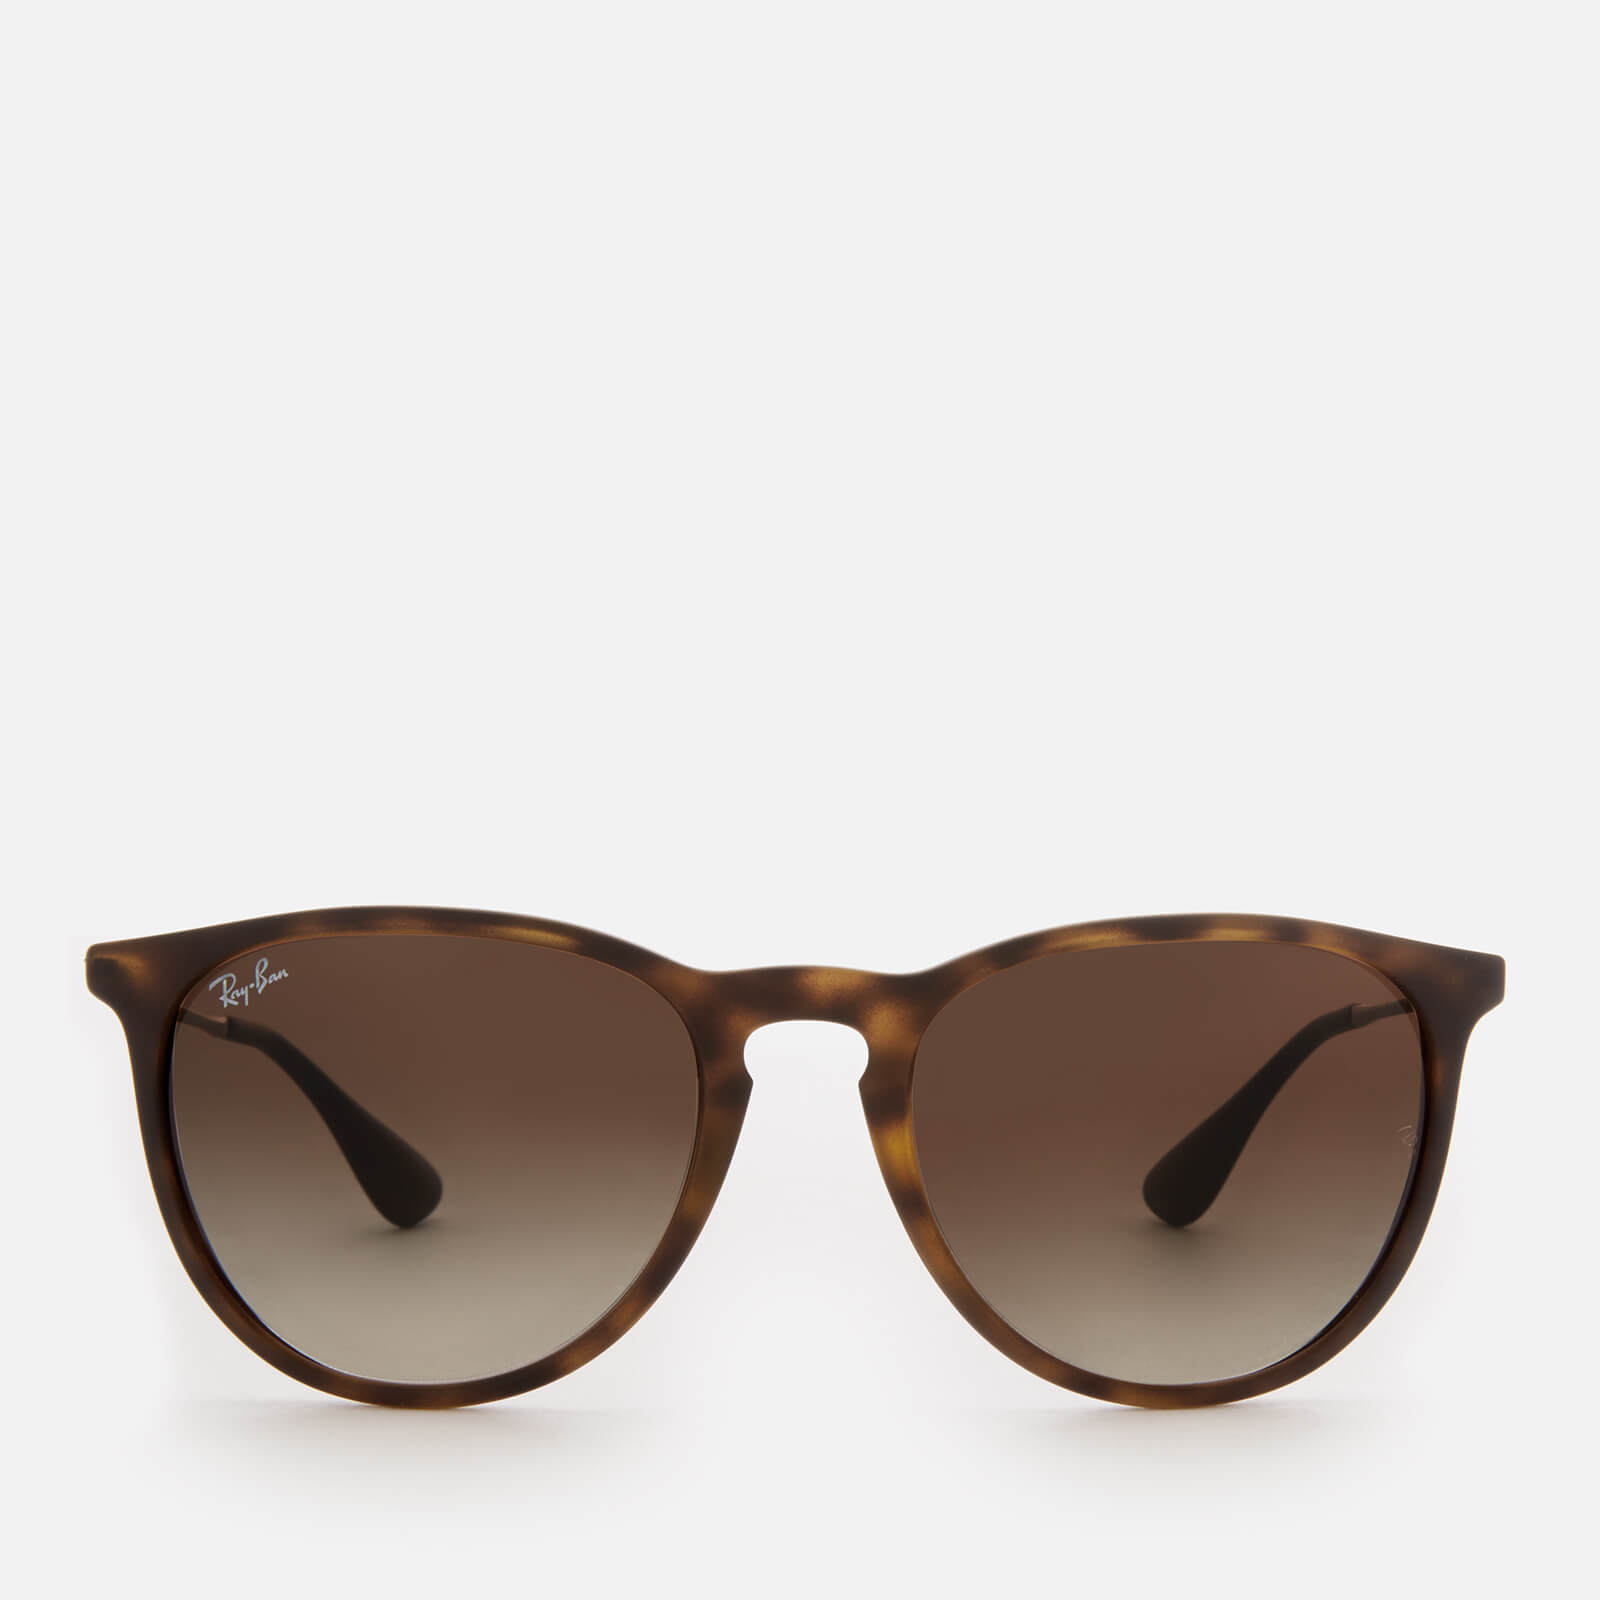 e89017355c450 Ray-Ban Erika Wayfarer Sunglasses - Rubber Havana - Free UK Delivery over  £50